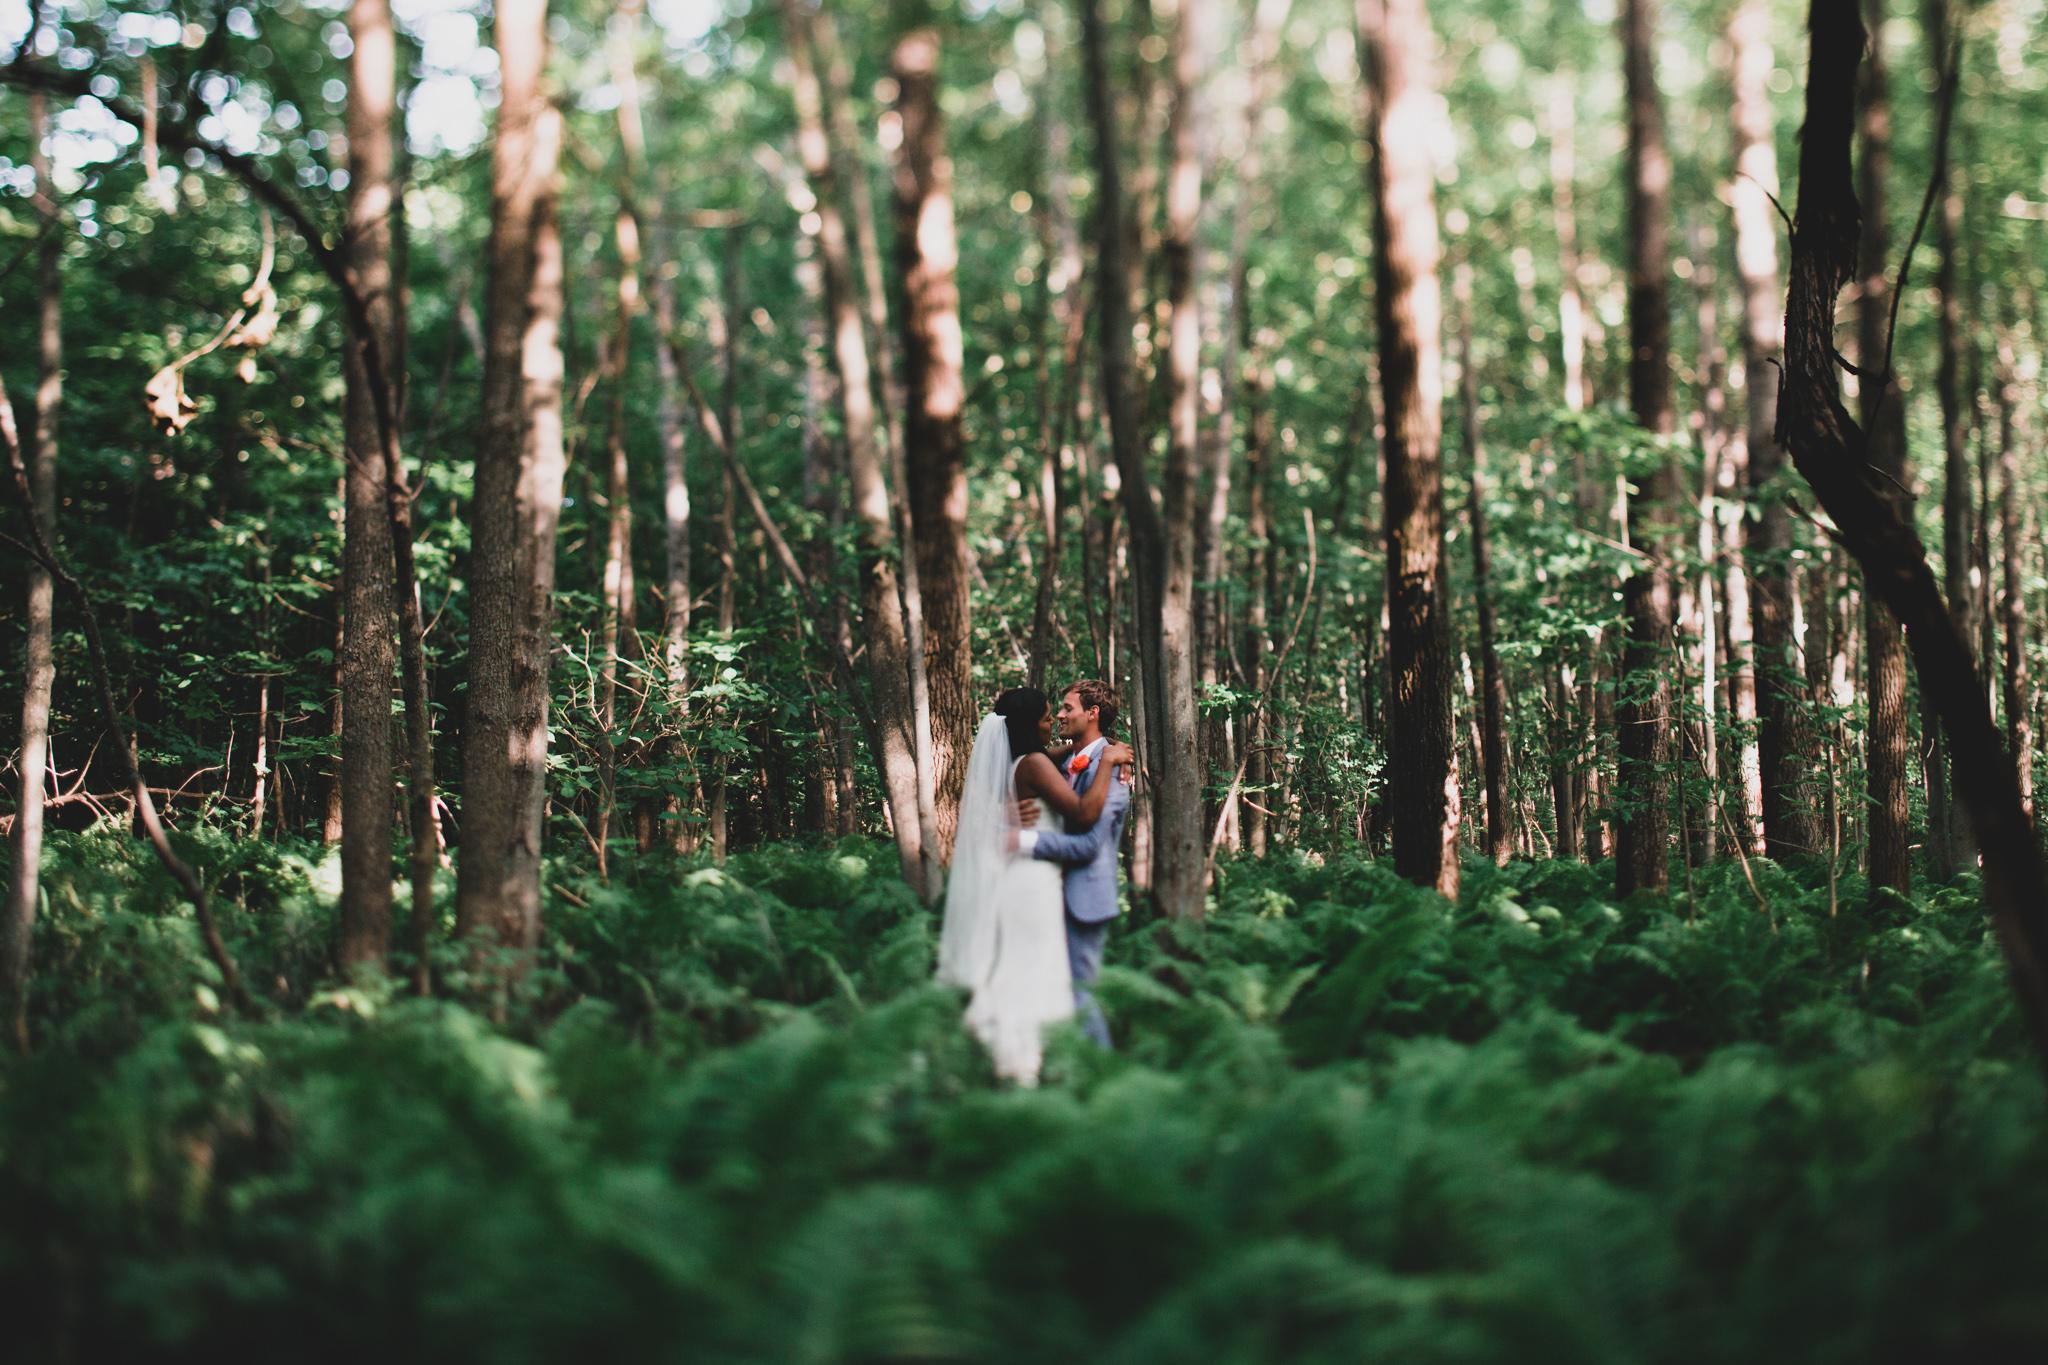 Nature, outdoorsy wedding portraits Ottawa